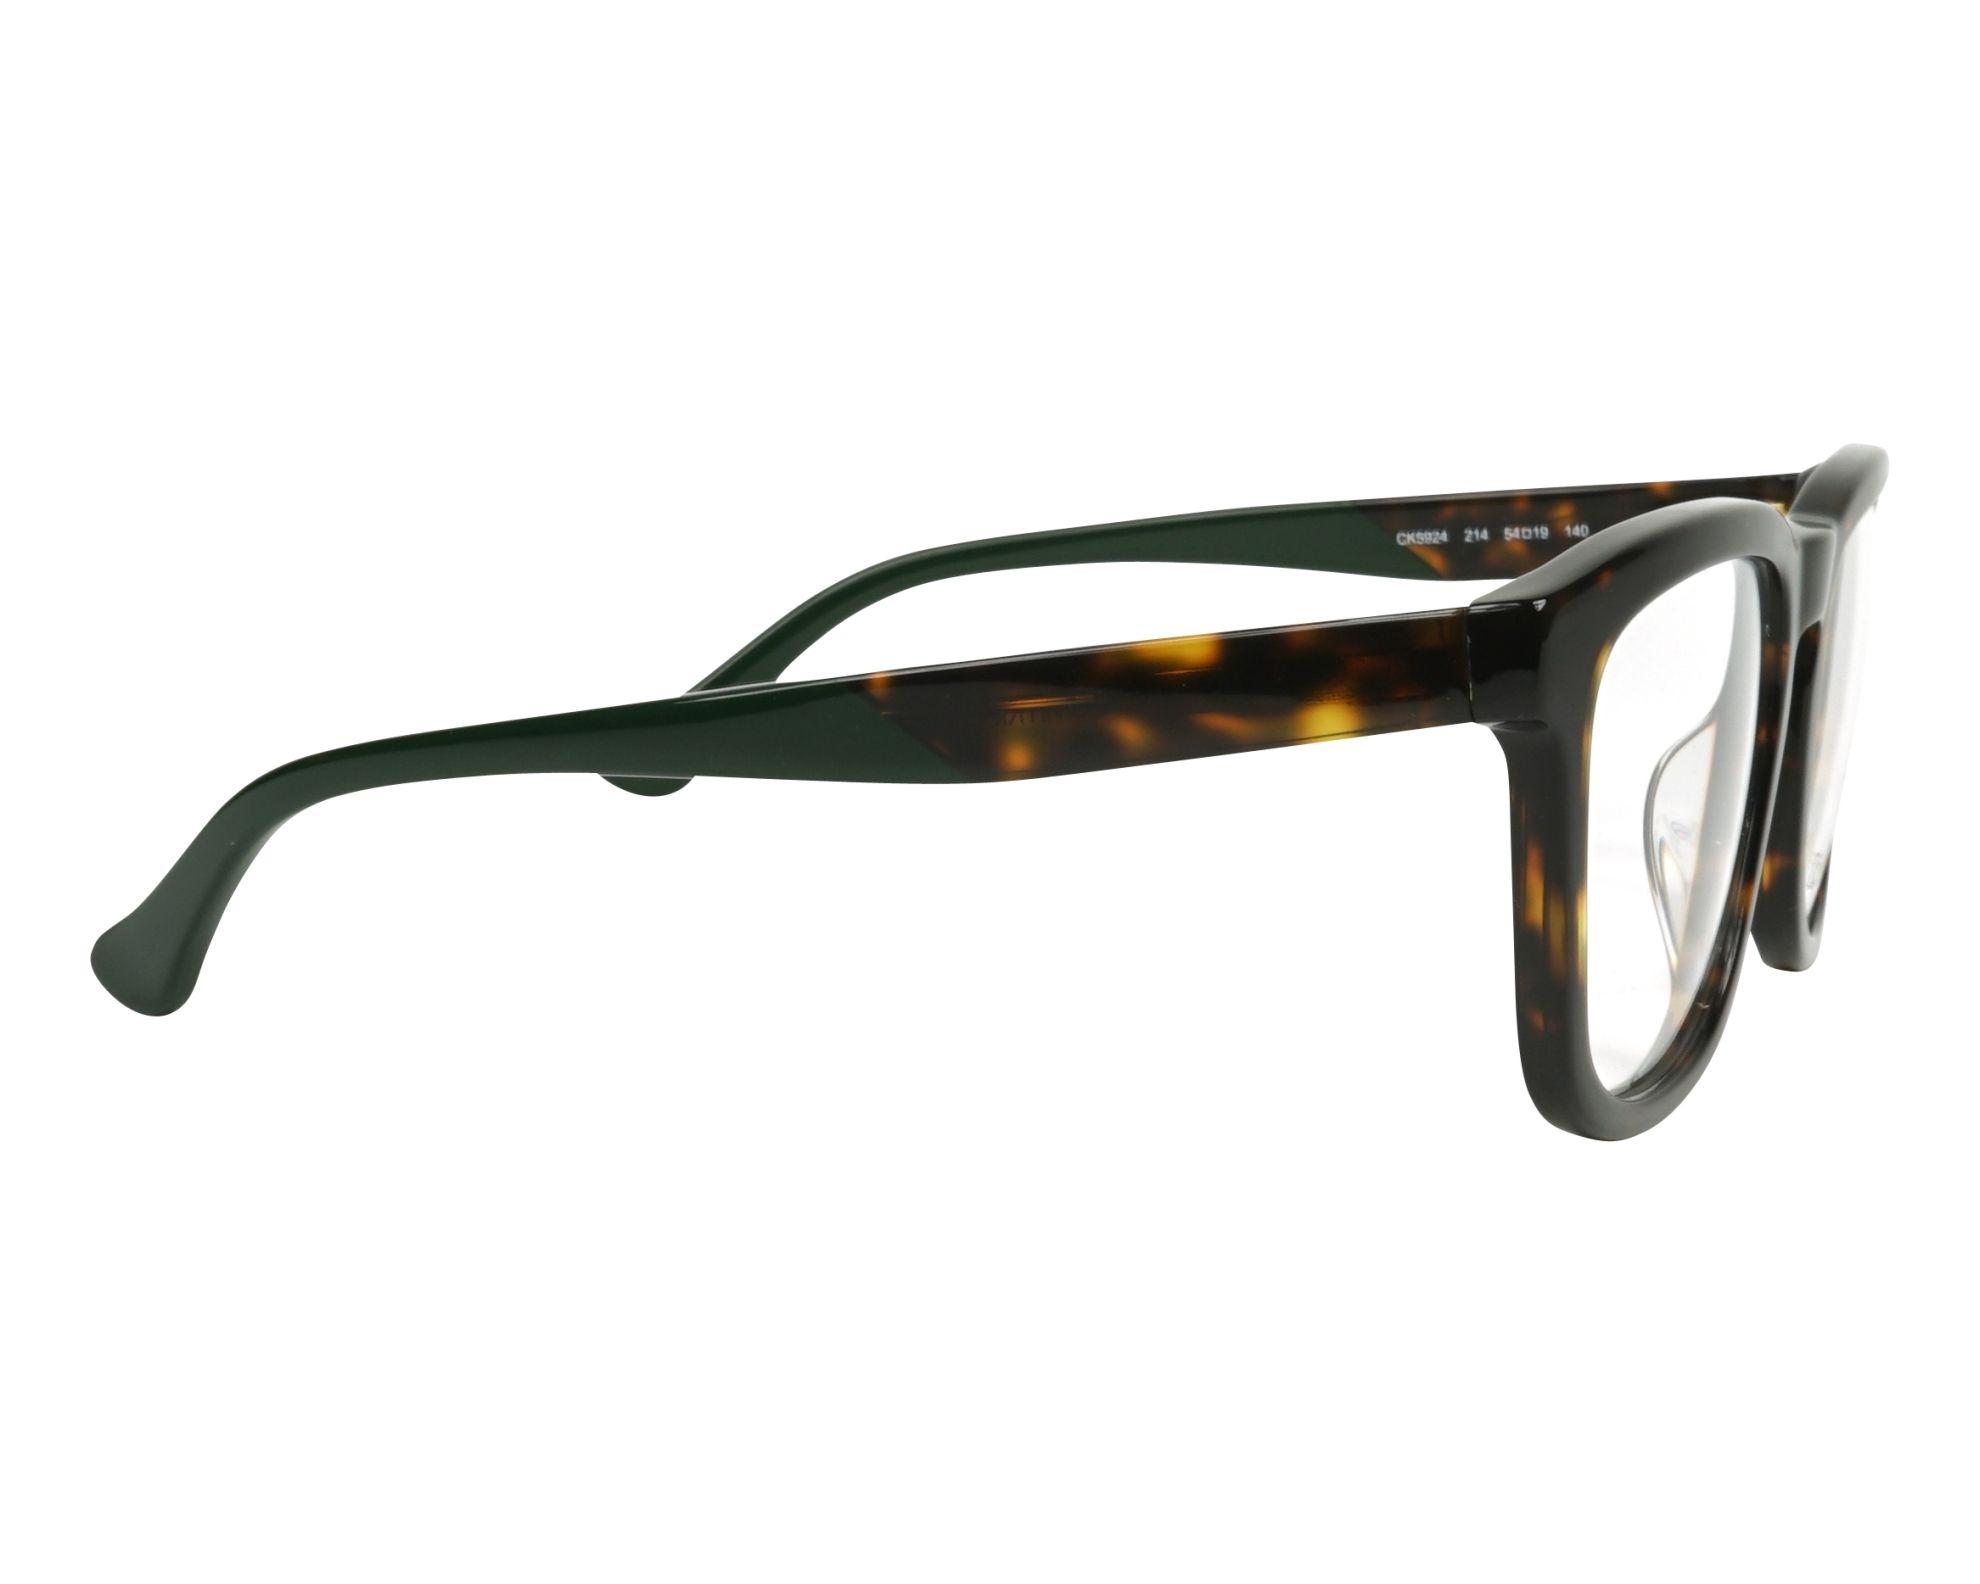 6877cb88cc Gafas Graduadas Calvin Klein CK-5924 214 54-19 Havana Verde vista lateral